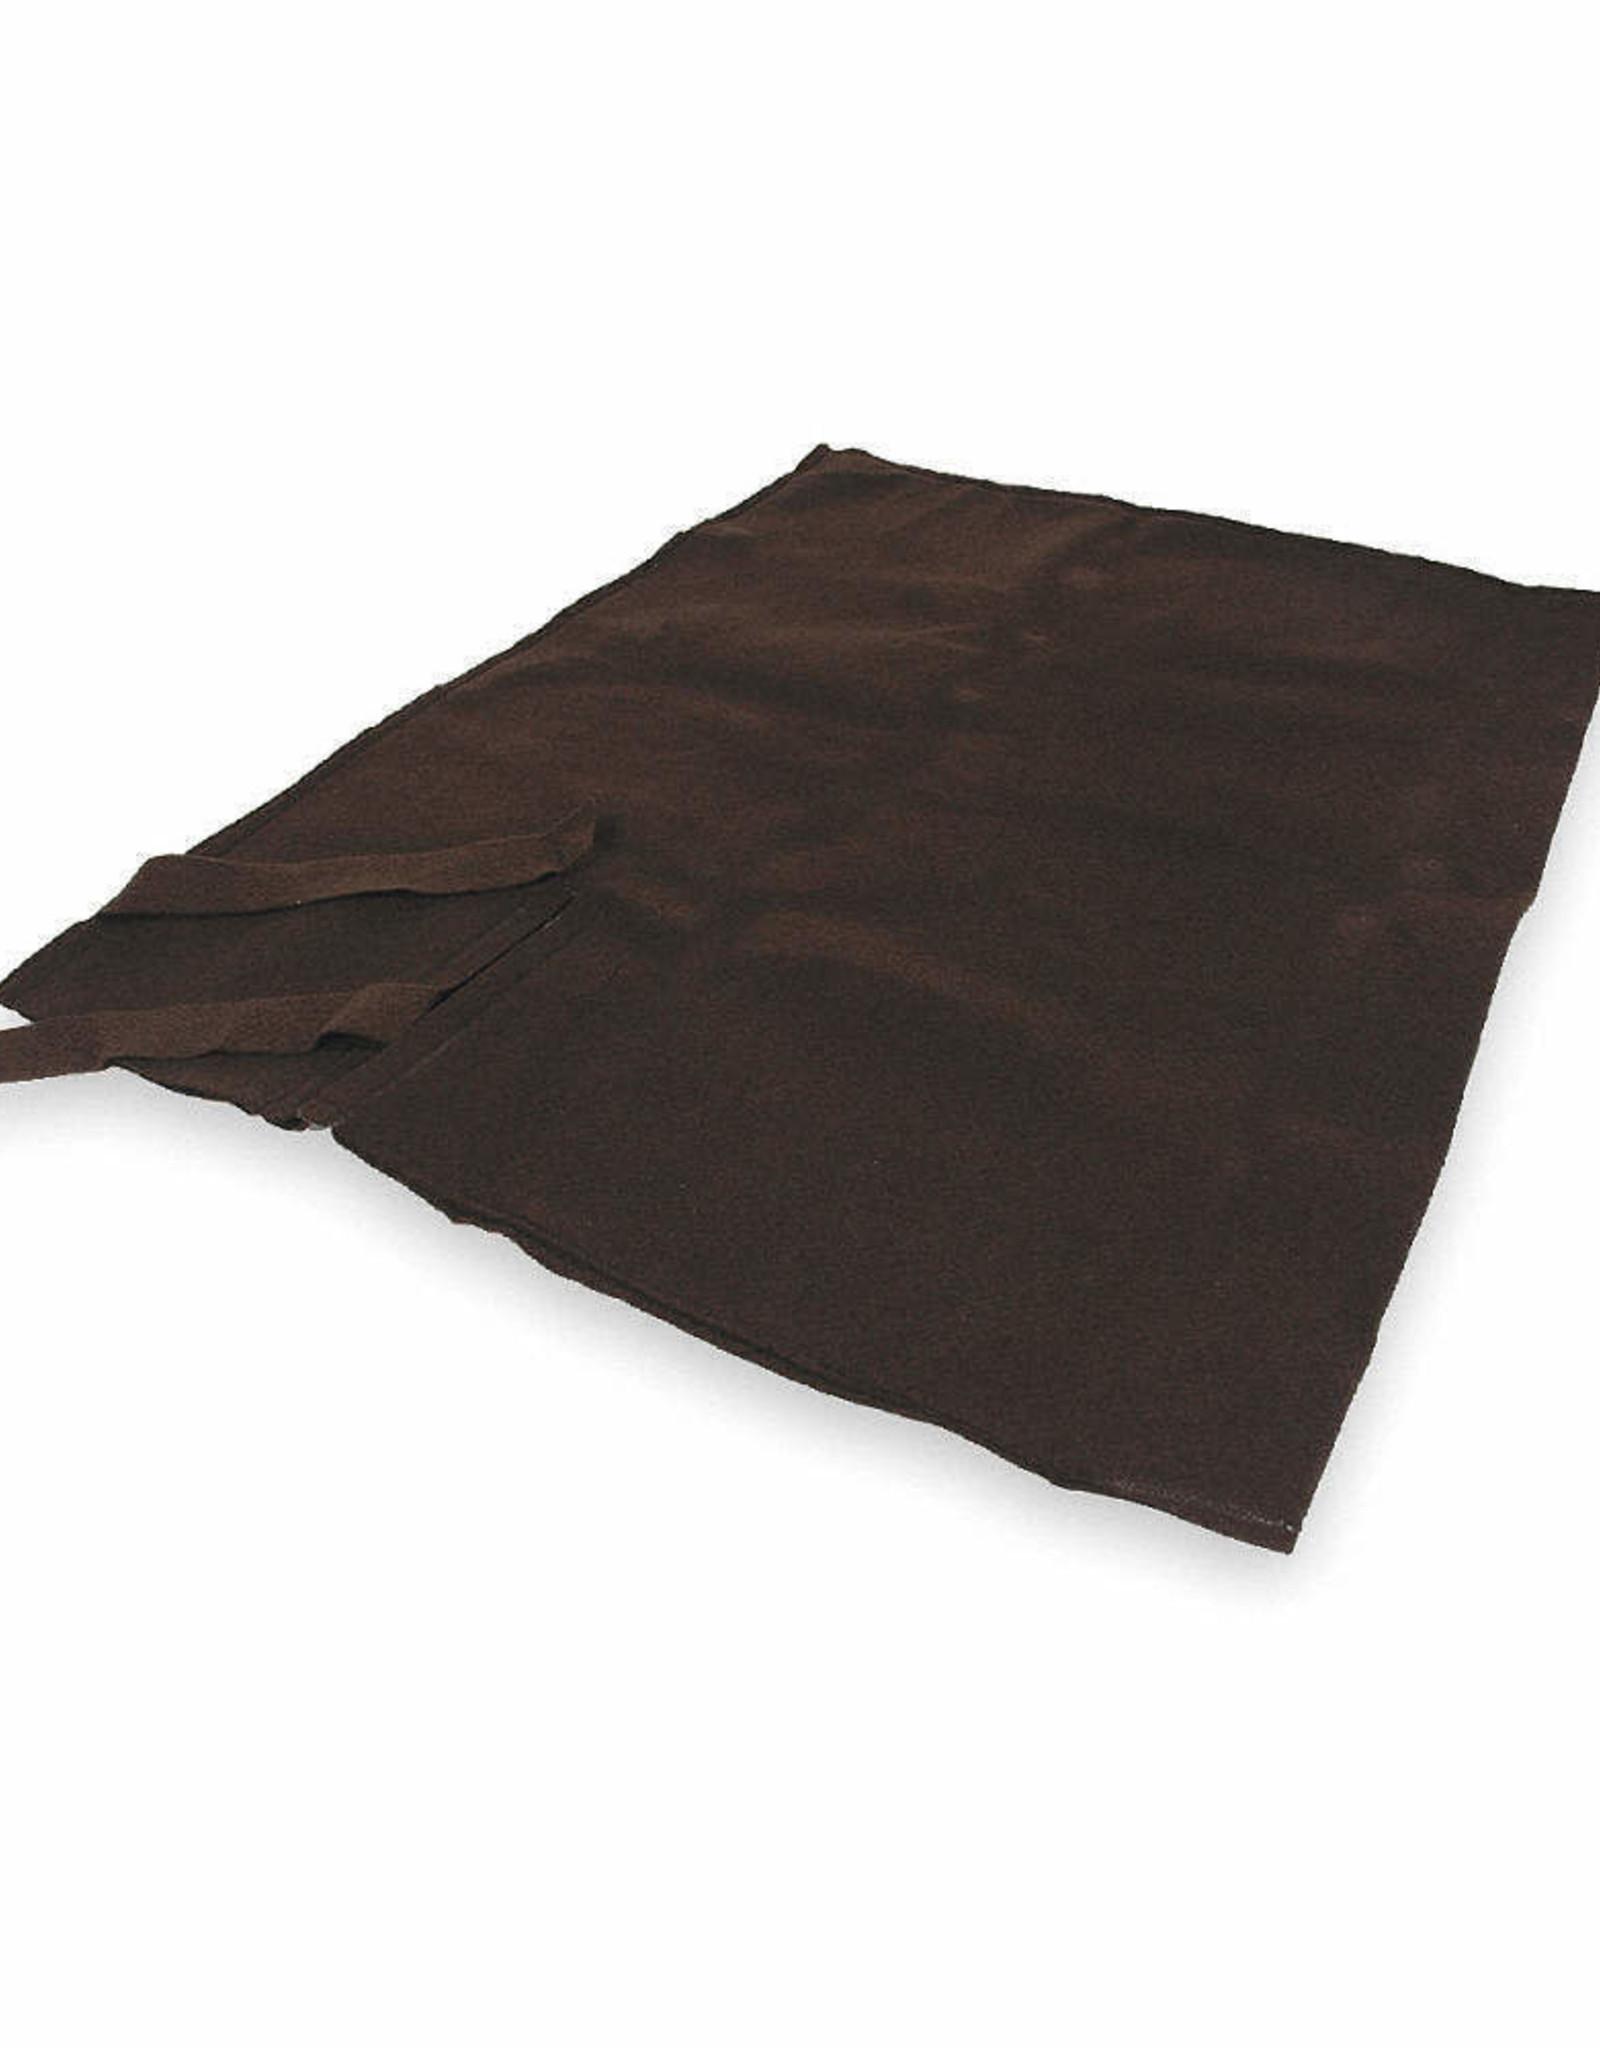 Dewatering Bag,  Woven Monofilament Geotextile Material  SZ. 10' x 10'